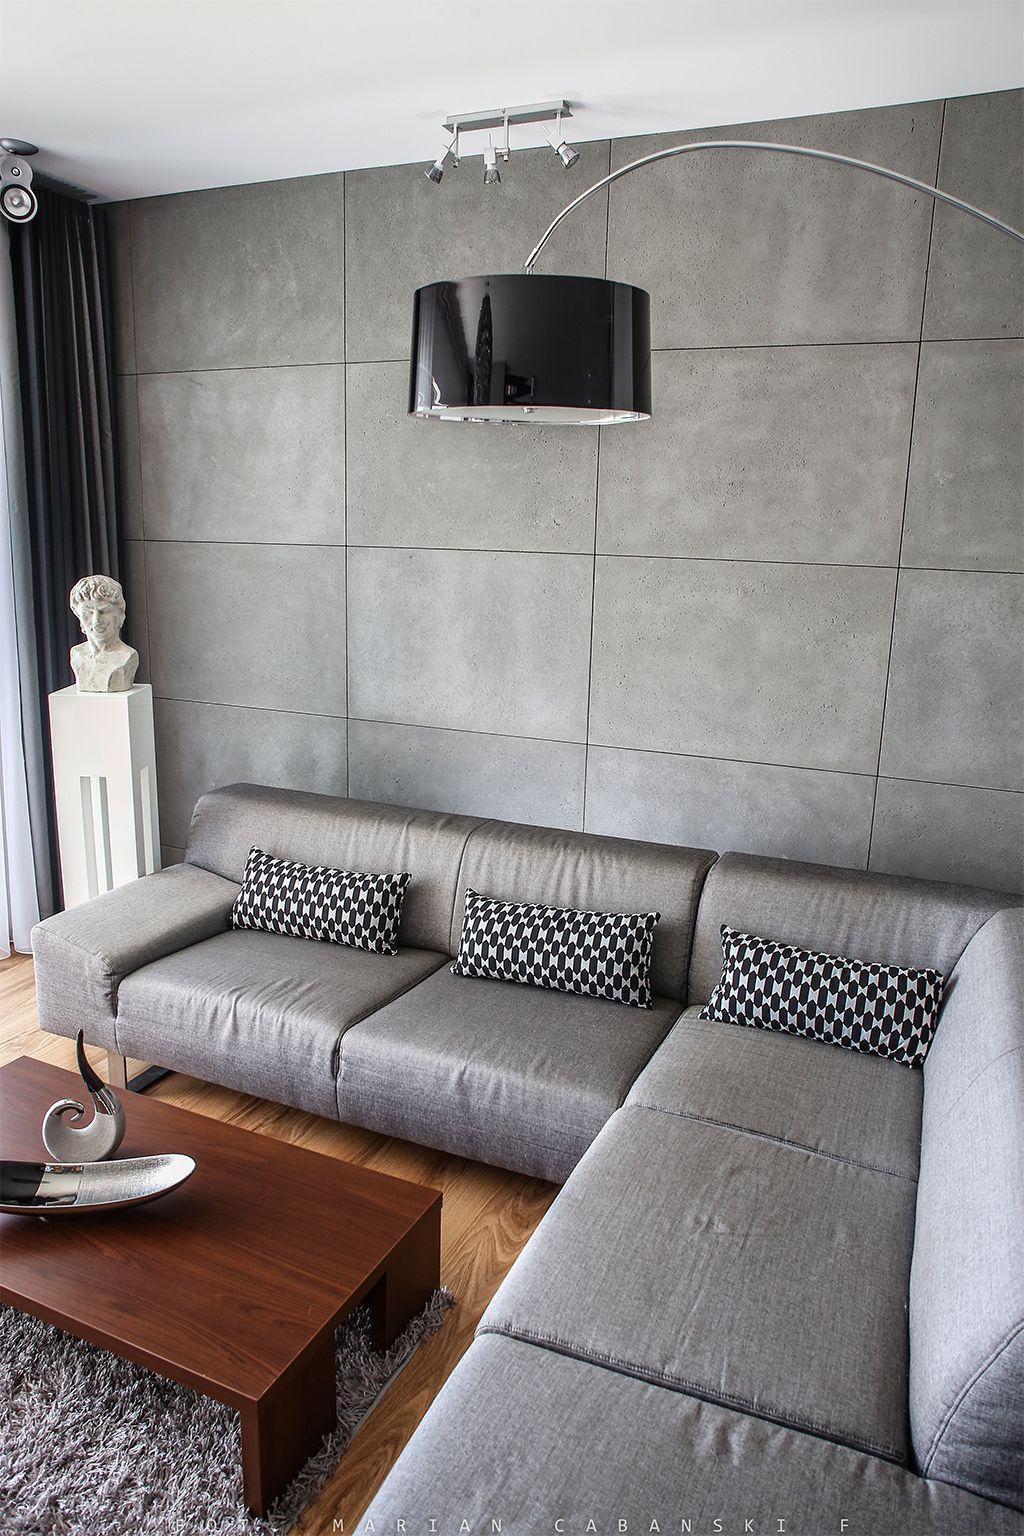 Concrete Plates Płyty Betonowe Home Room Design Concrete Interiors Concrete Walls Interior